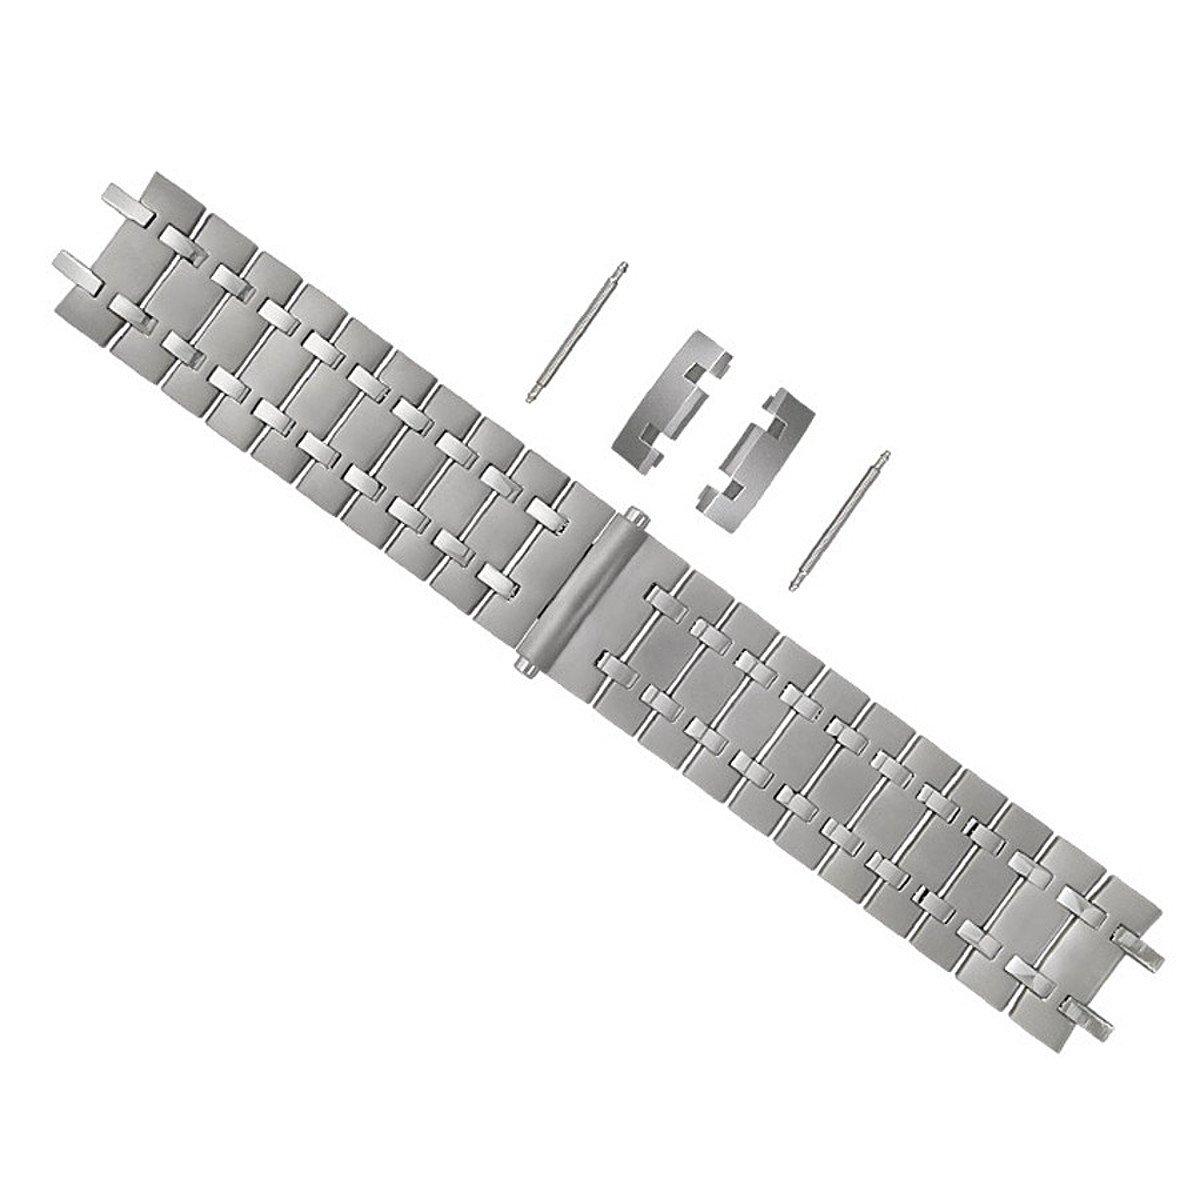 Suunto Elementum Band Stahl Gurt Kit Armbanduhr ZubehÖr - aqua-terra grau - One Size